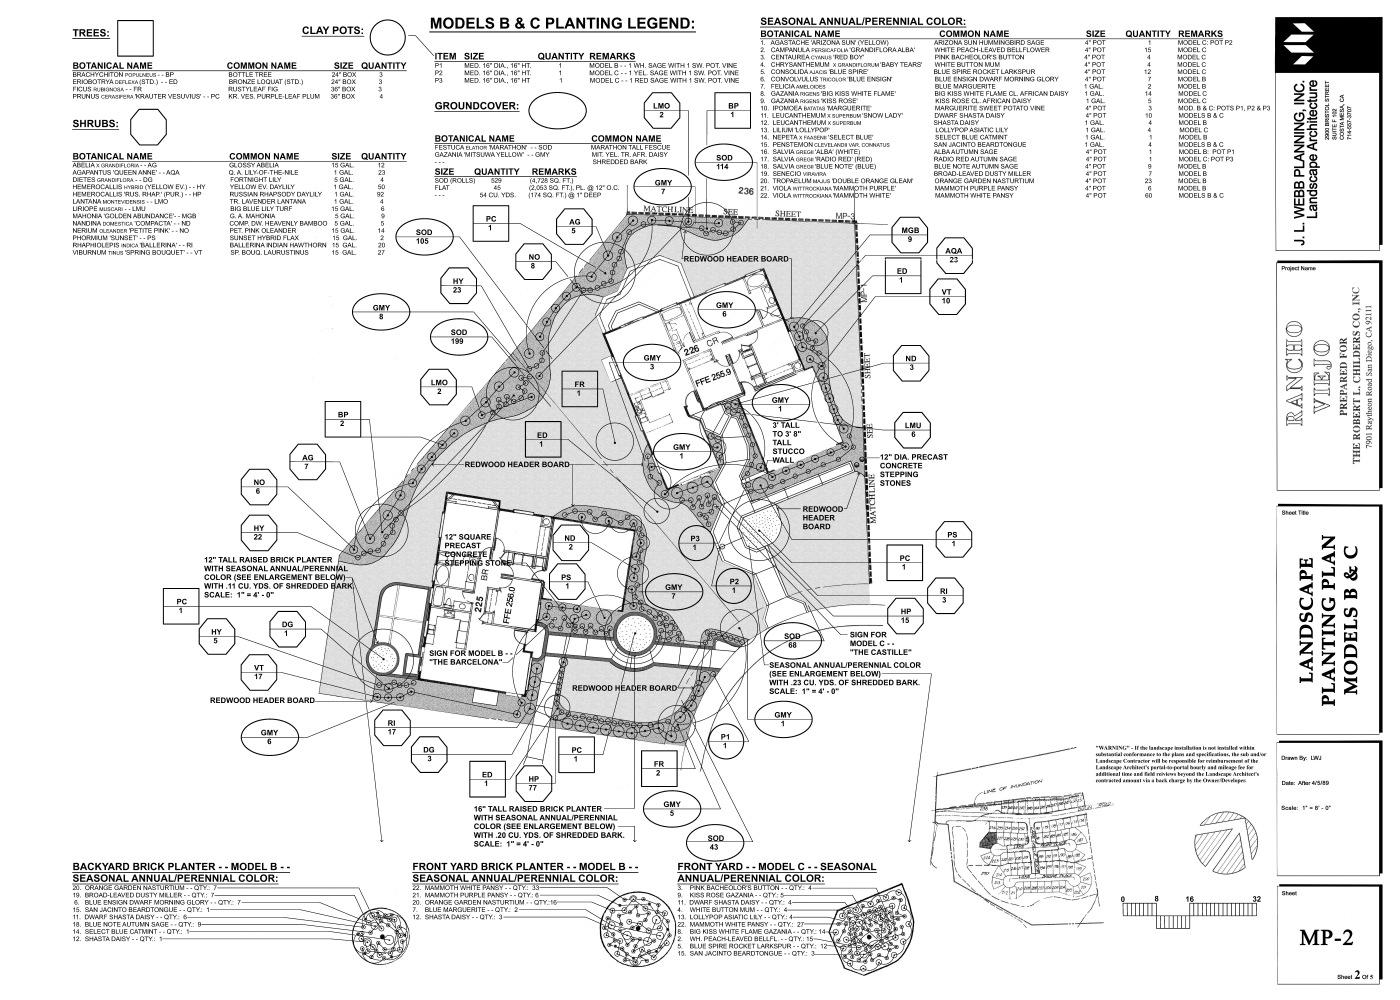 2017 Full Size B & C Model Planting Plans Rancho Viejo